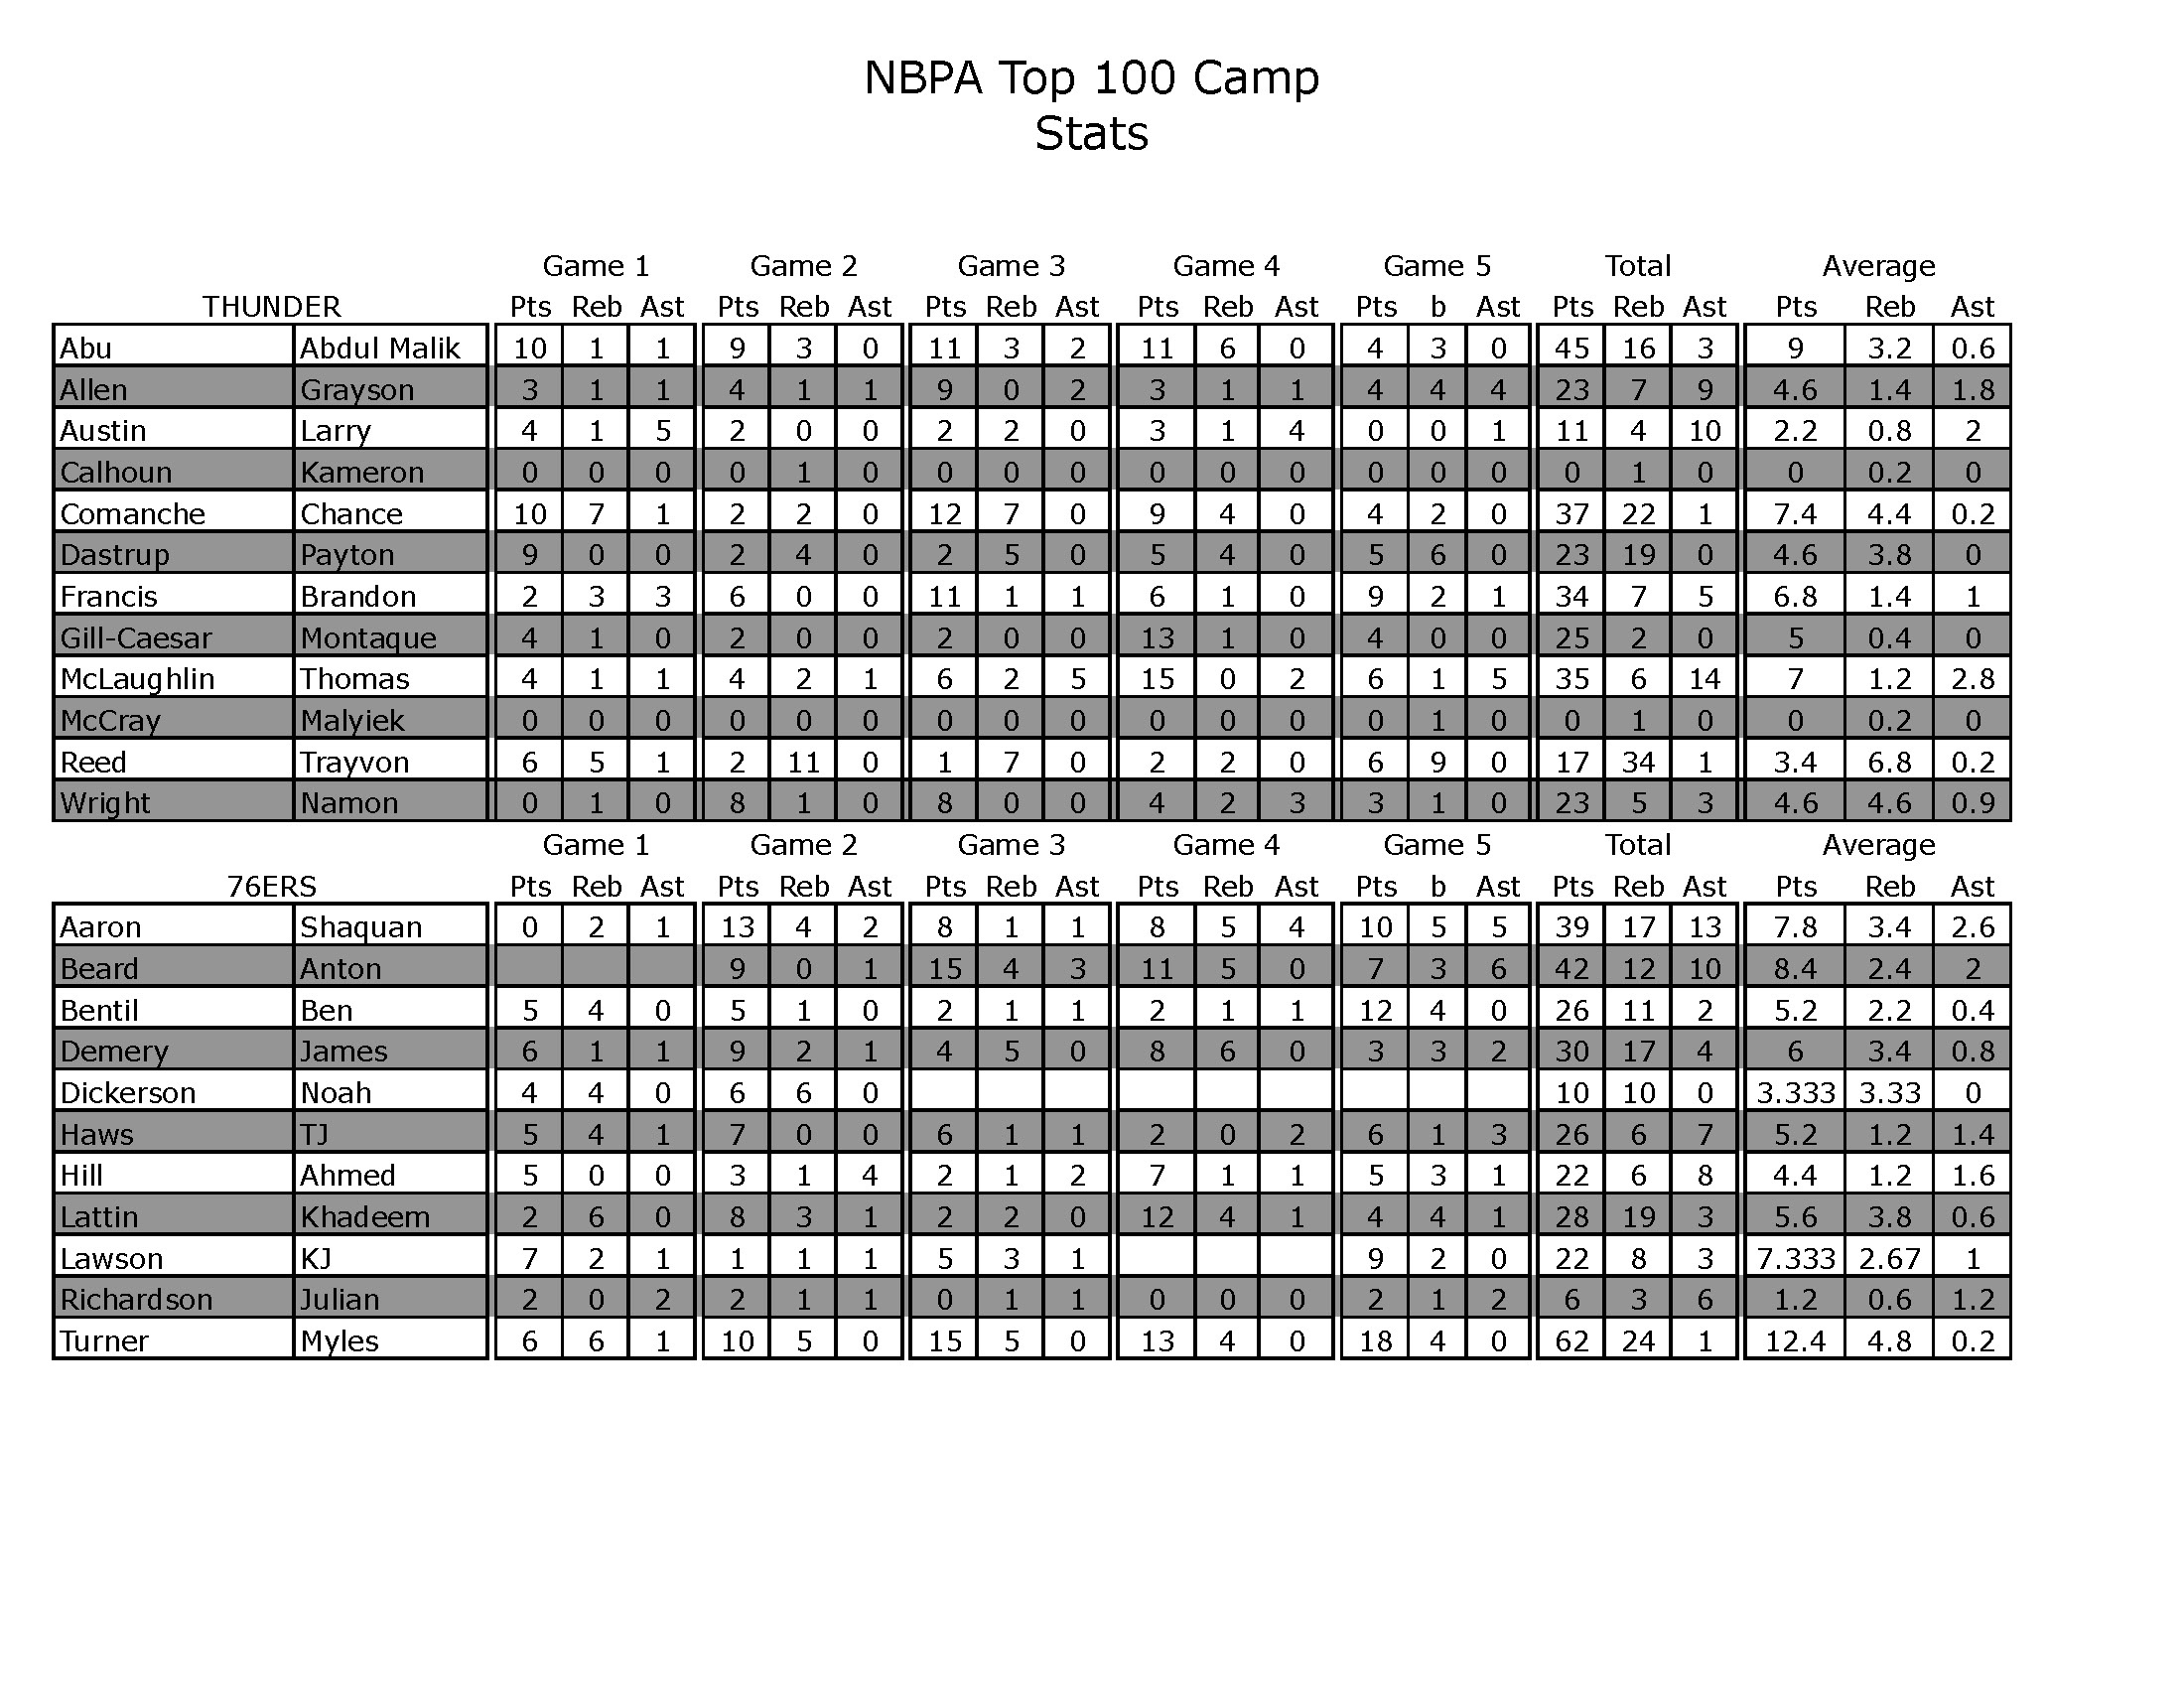 NBPA STATS FINAL_Page_5